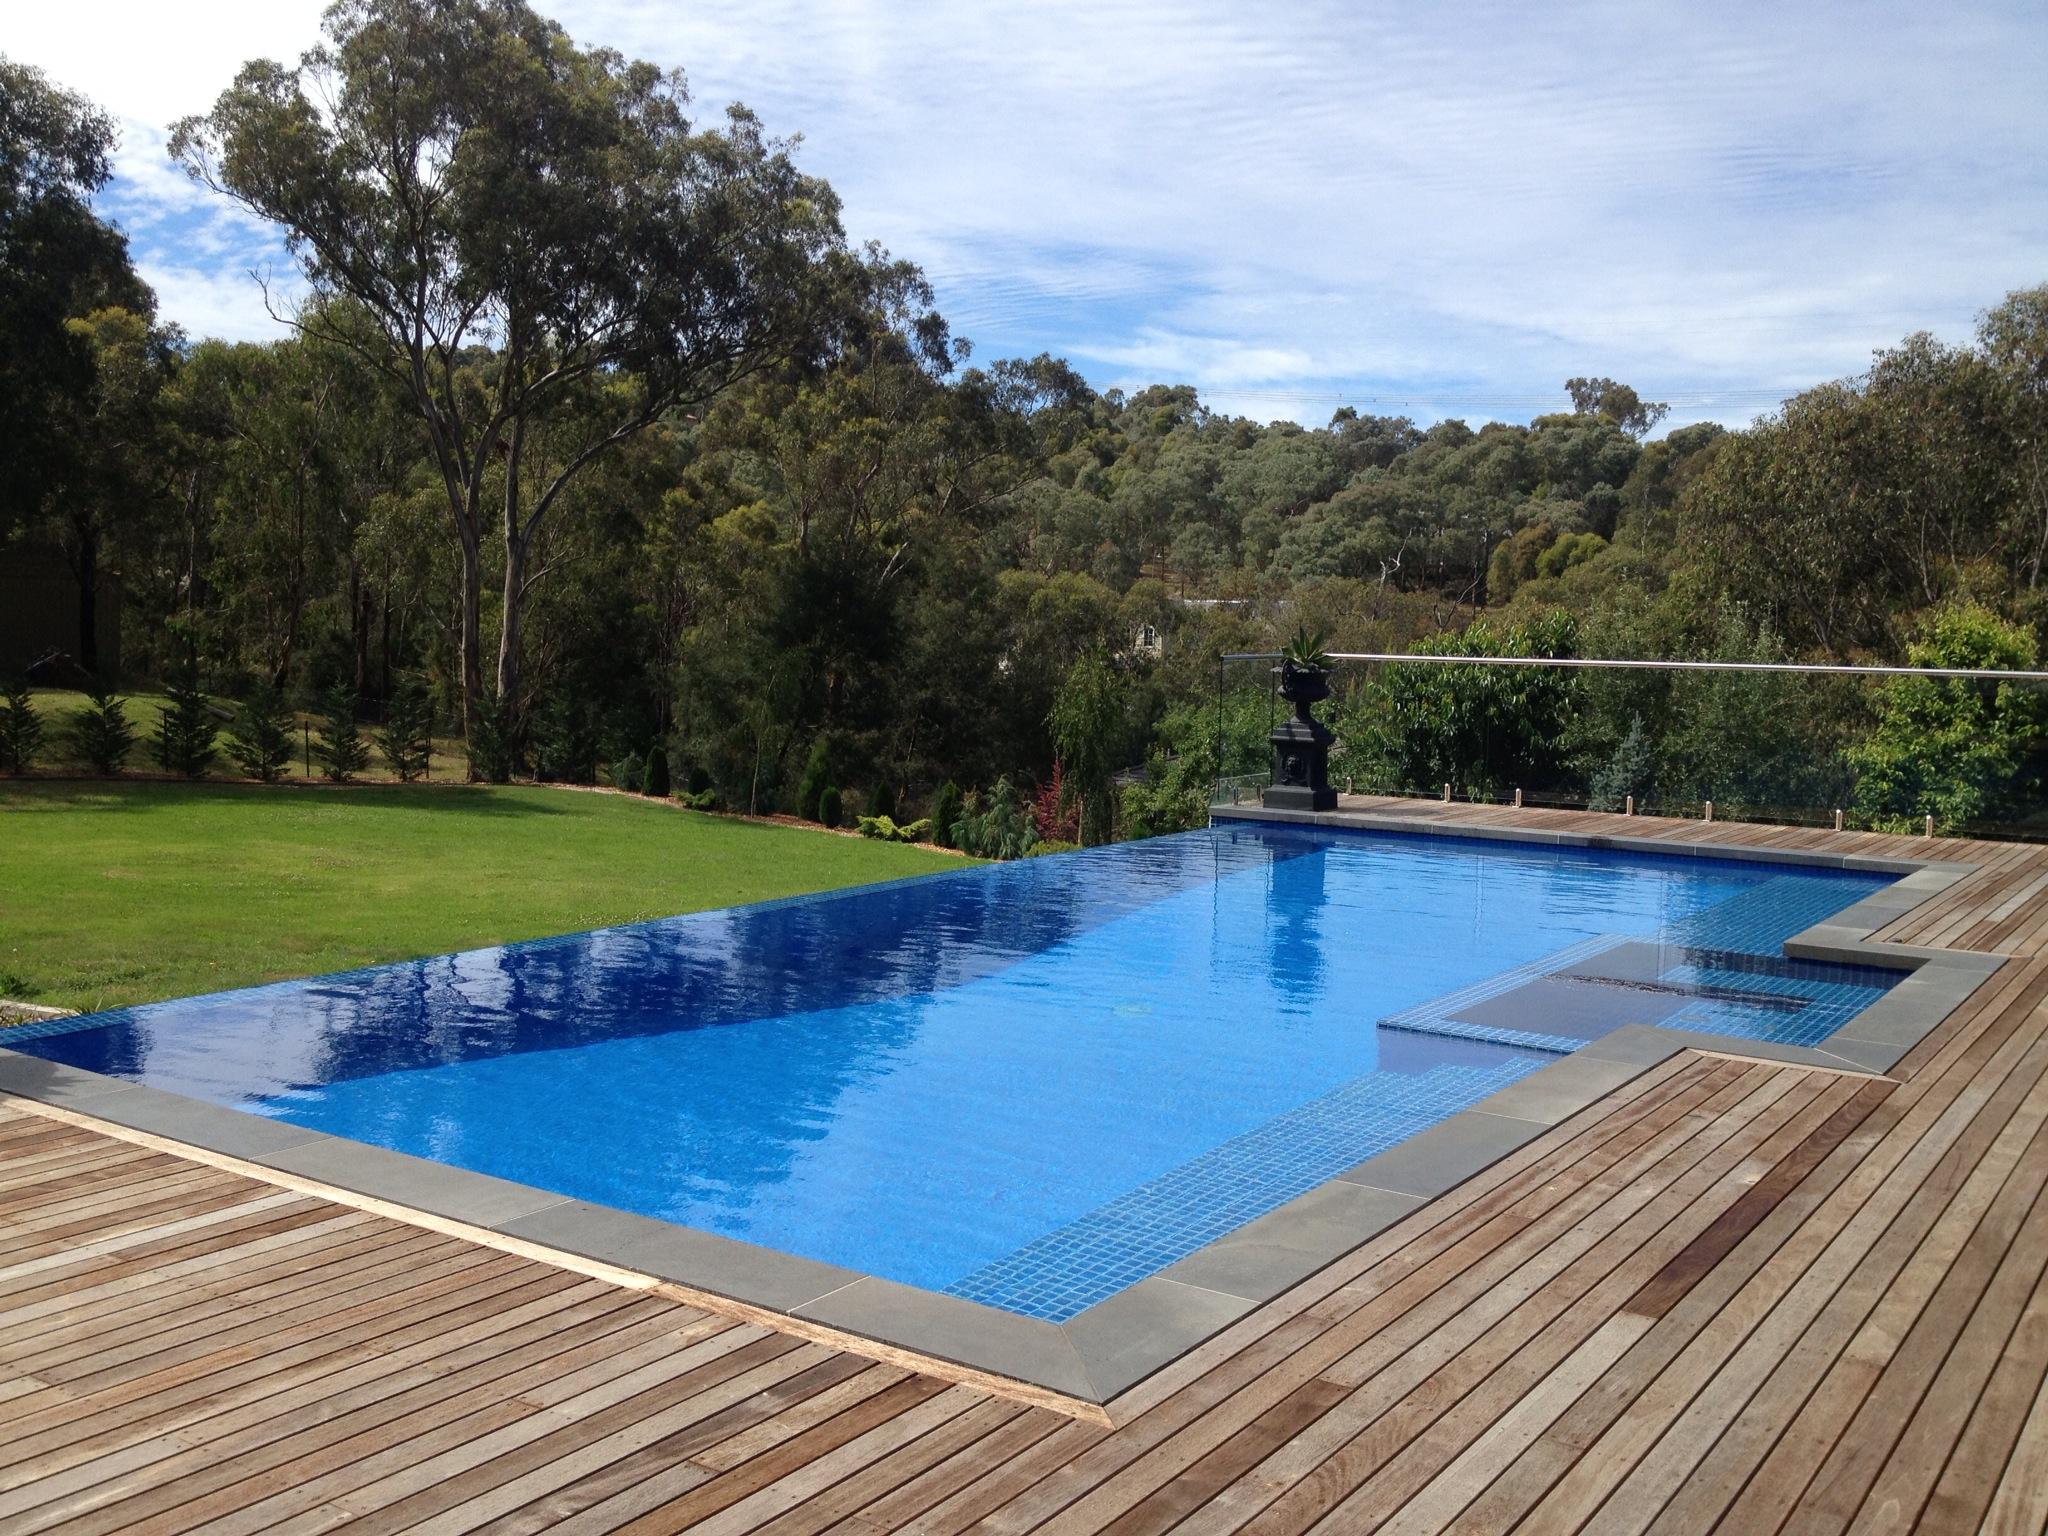 Impressive Infinity Pool Design No Edges No Boundaries